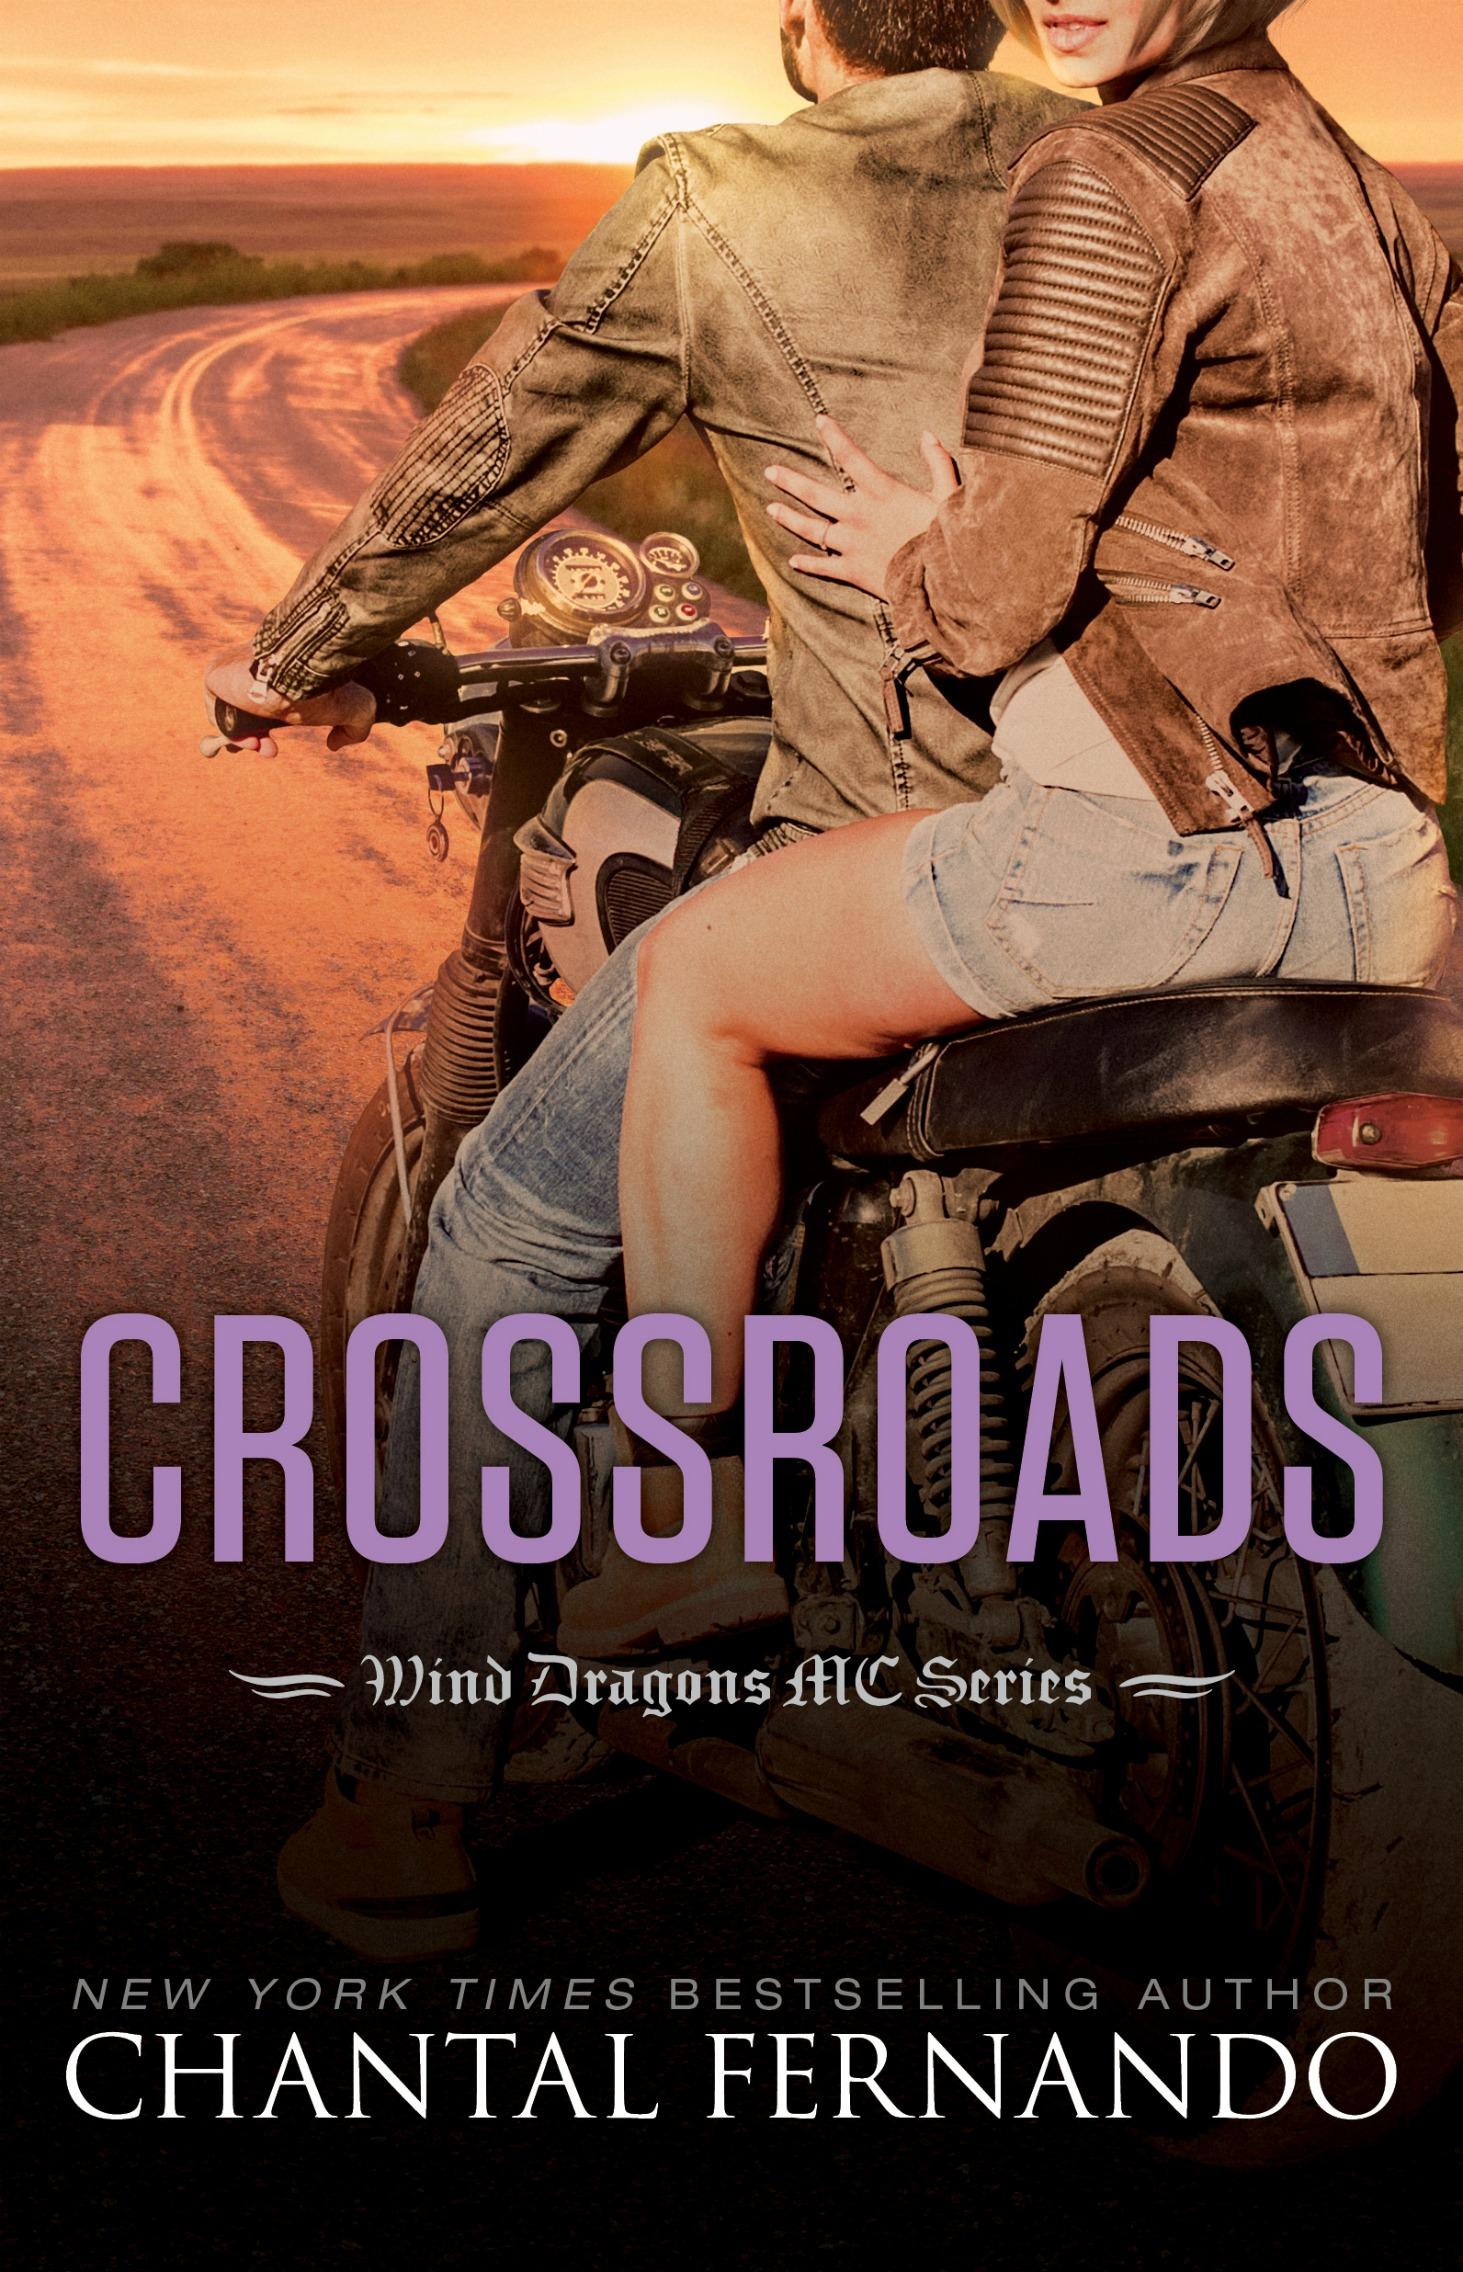 Release Day Blitz & Giveaway: Crossroads (Wind Dragons MC #6) by Chantal Fernando